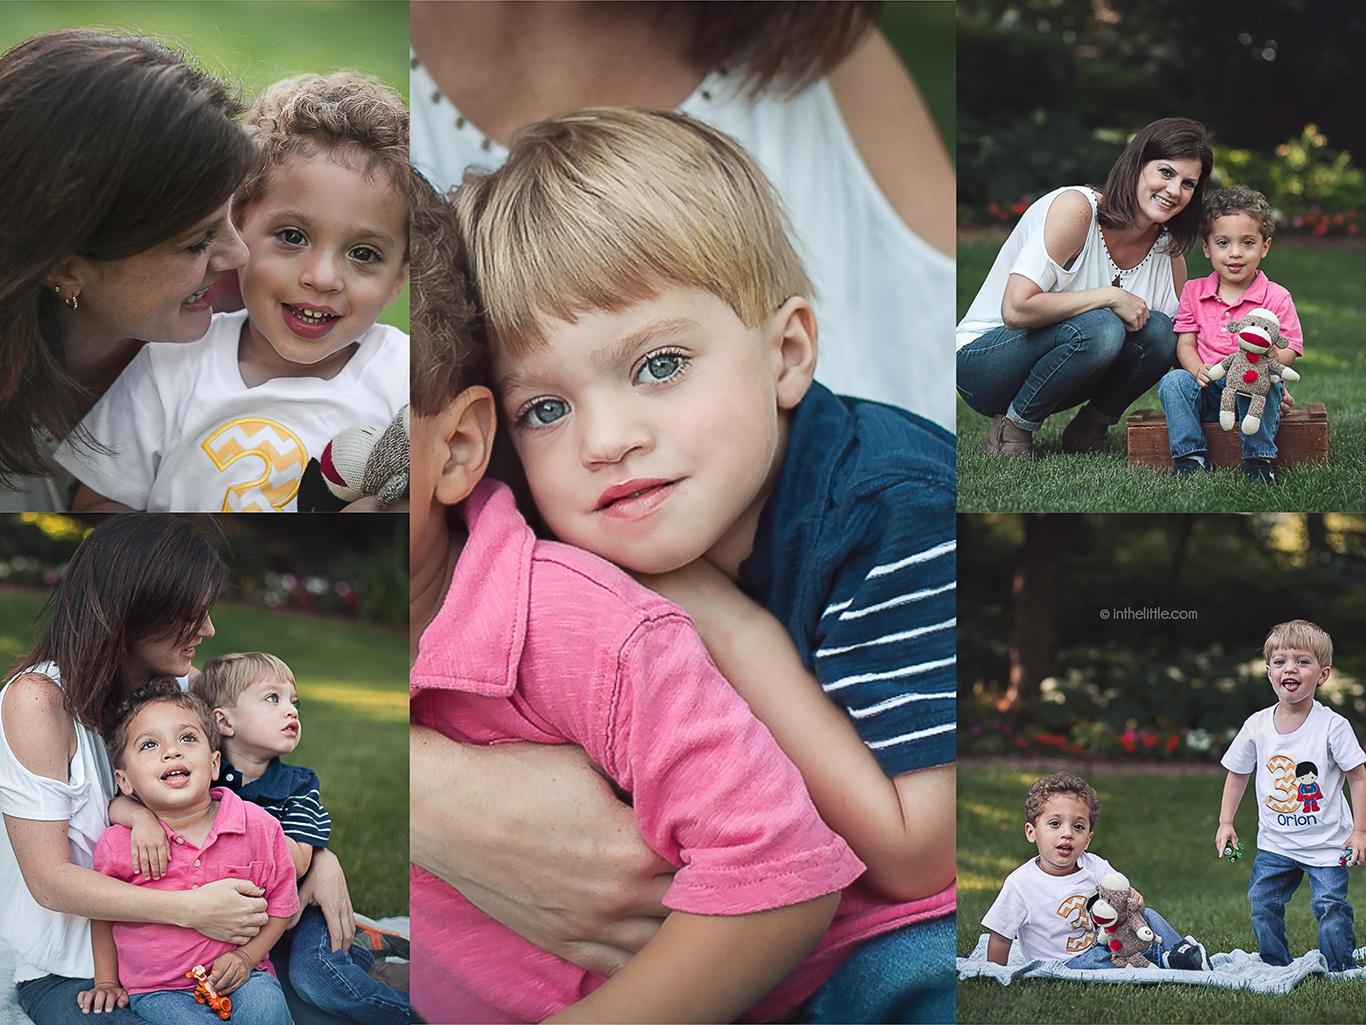 Best Family Photographer St. Louis Missouri near zipcode 63304